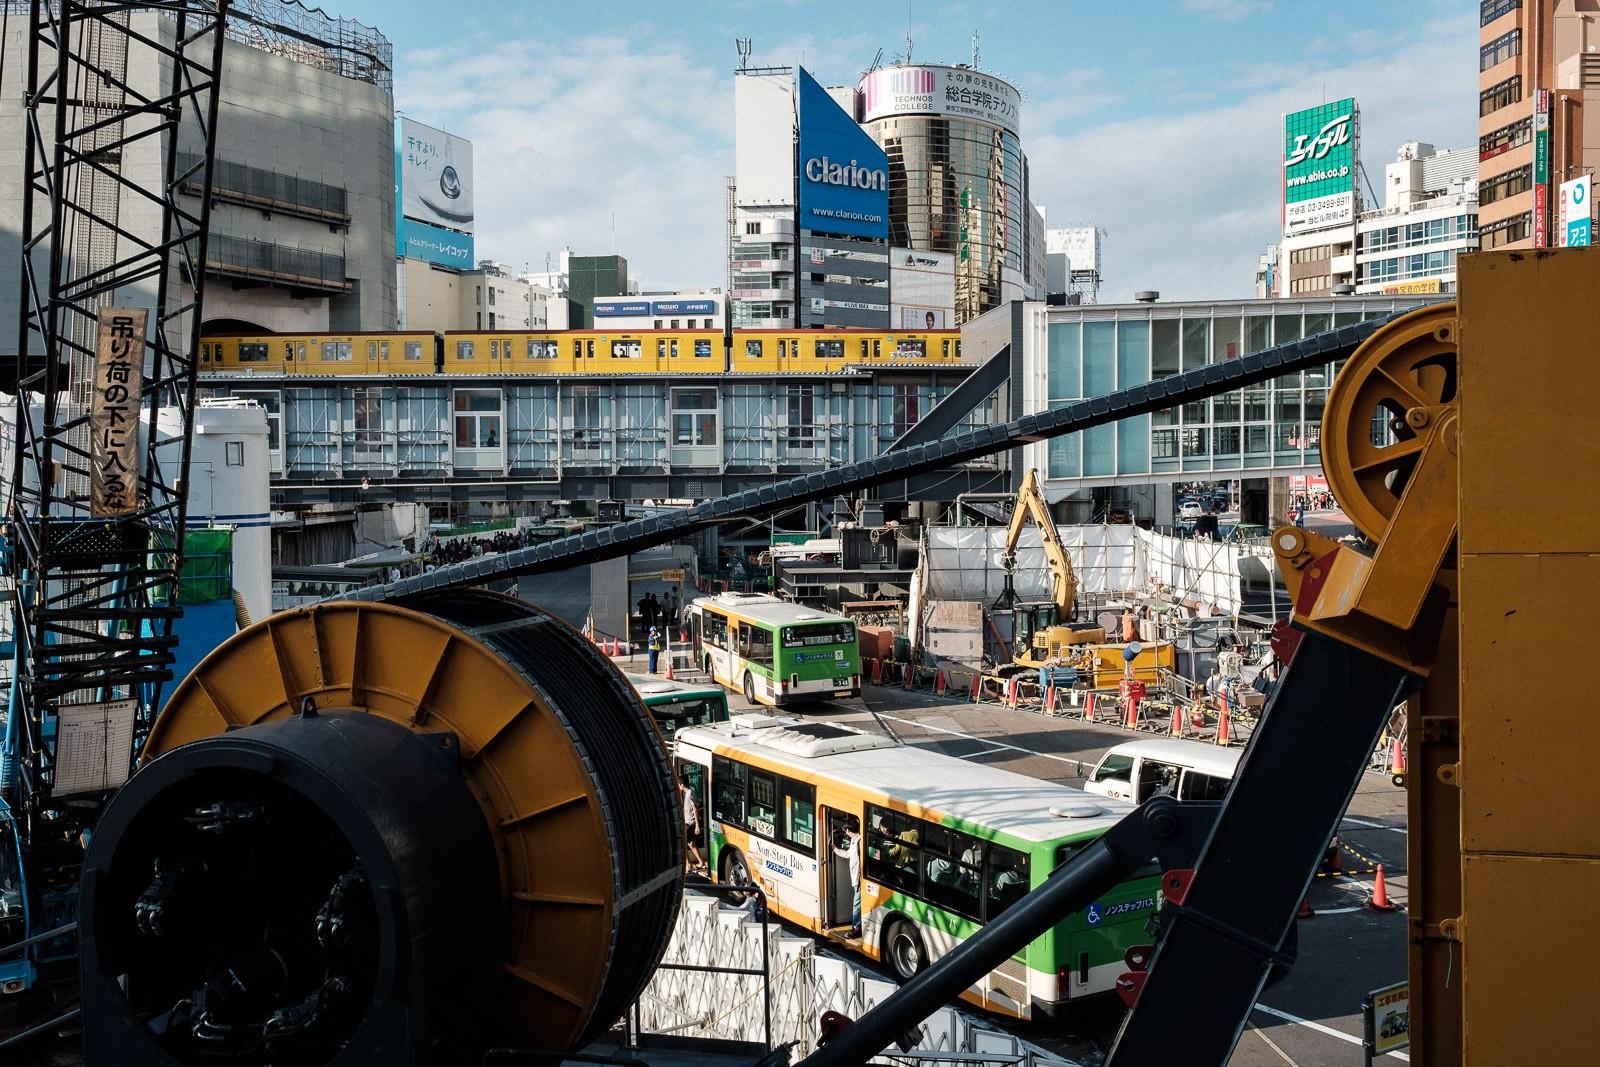 JR east construction site in shibuya Tokyo